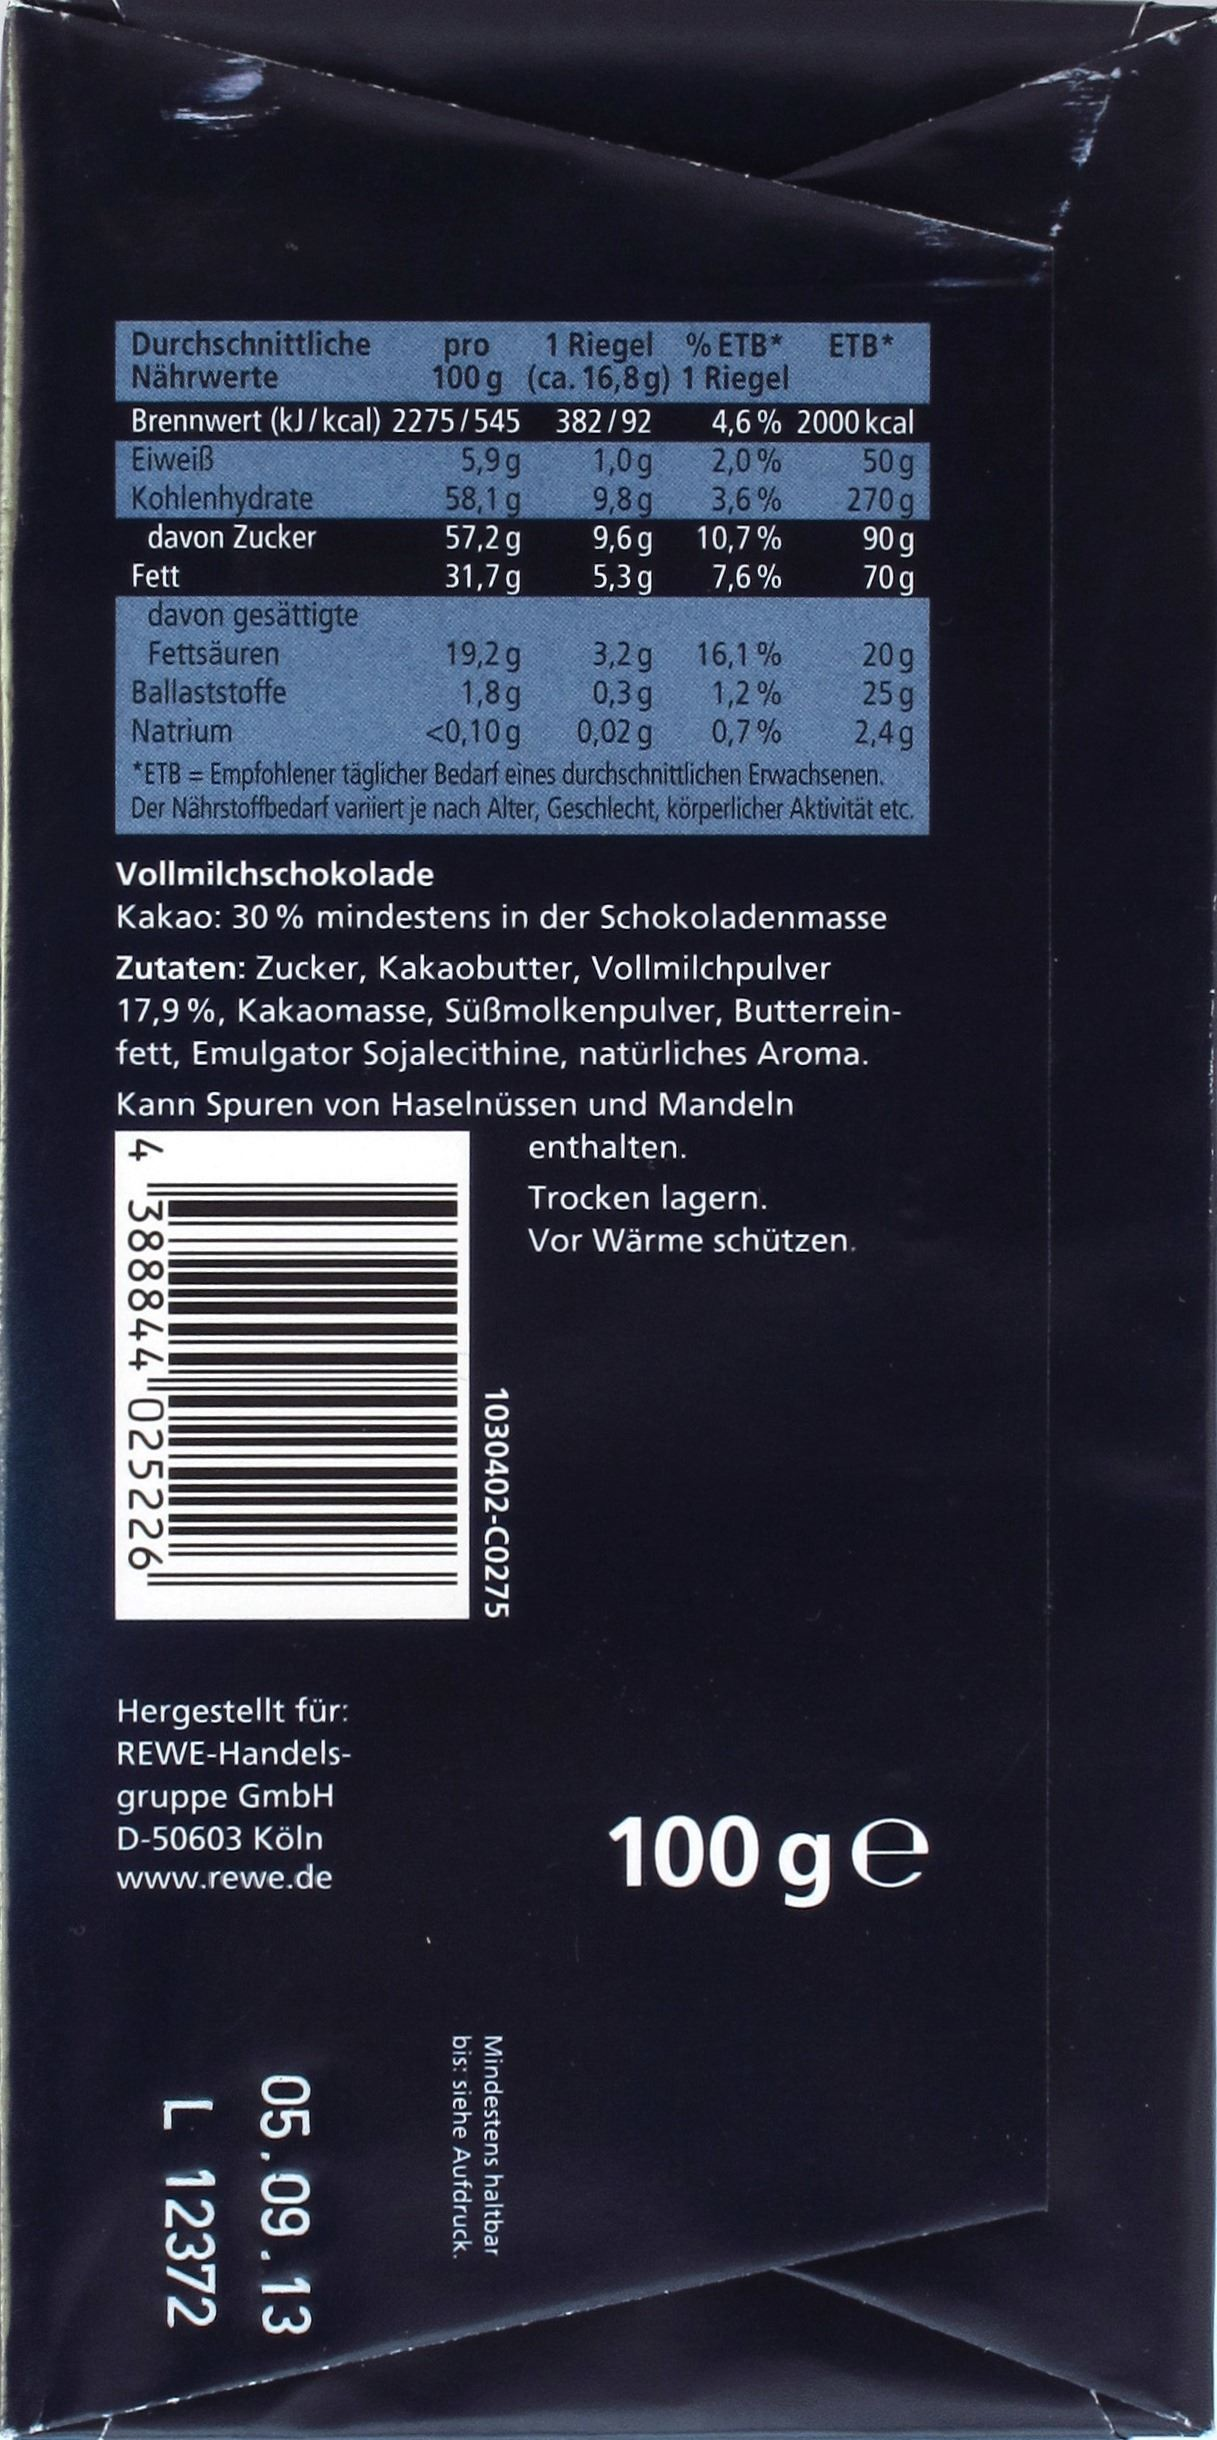 Rewe 30% Milchschokolade - Rückseite